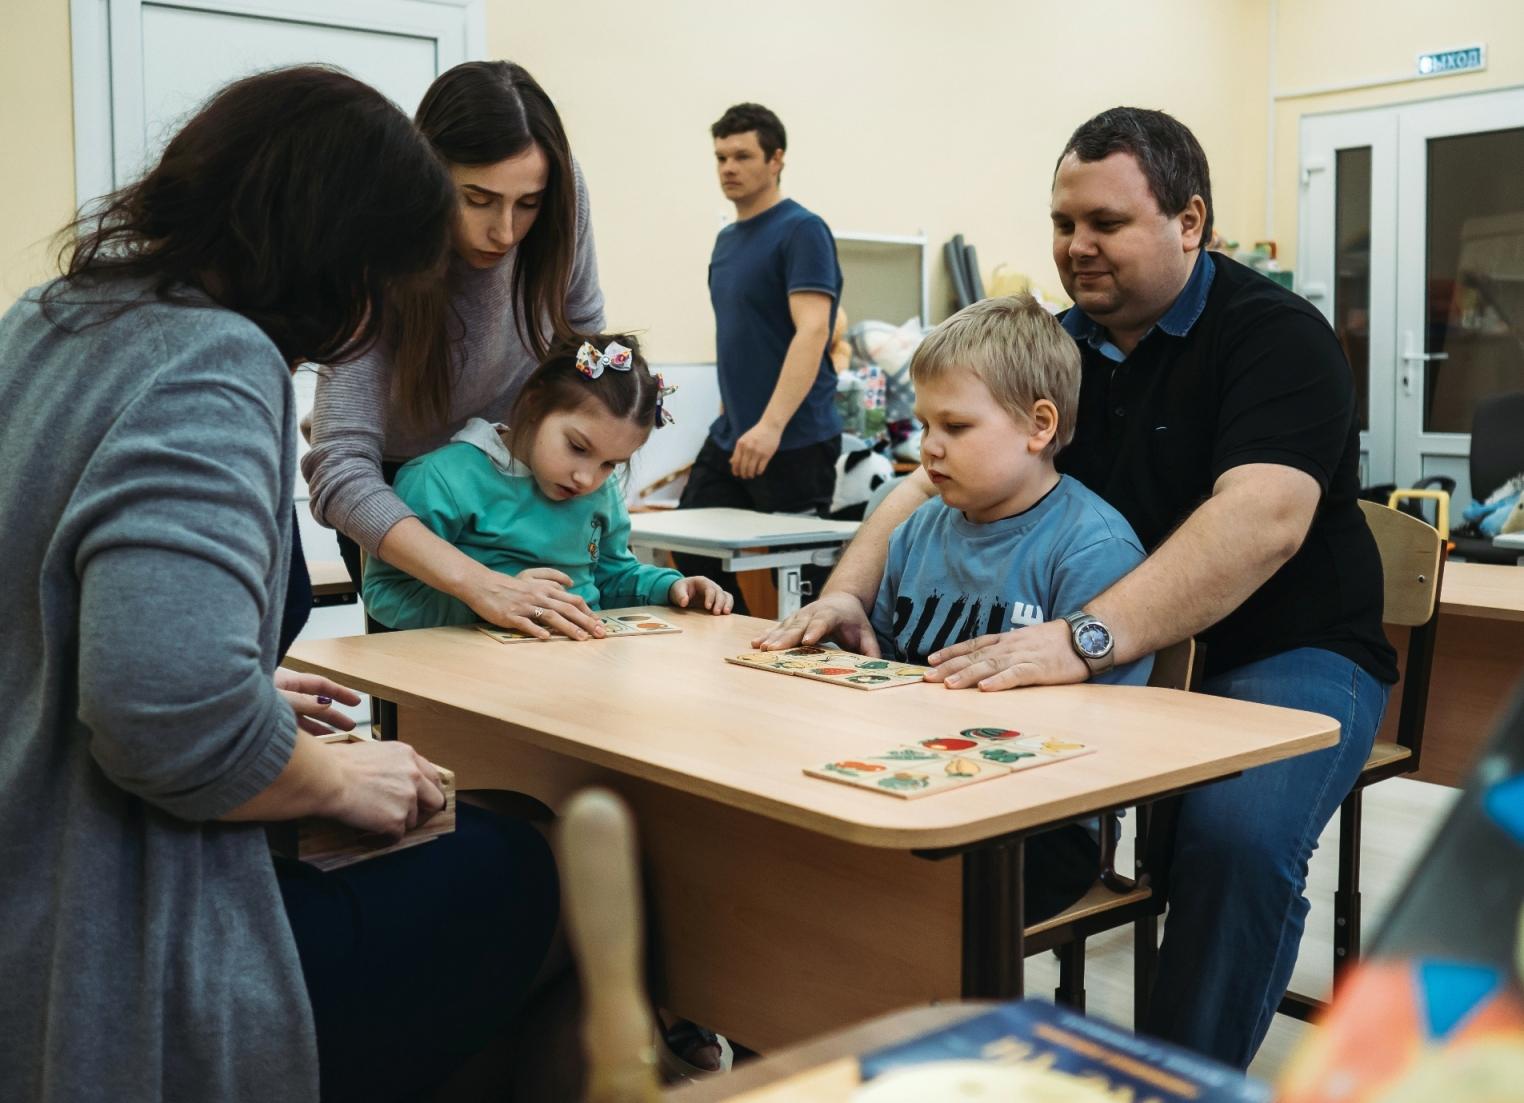 «ОМК-Участие»: восприятие инвалидности